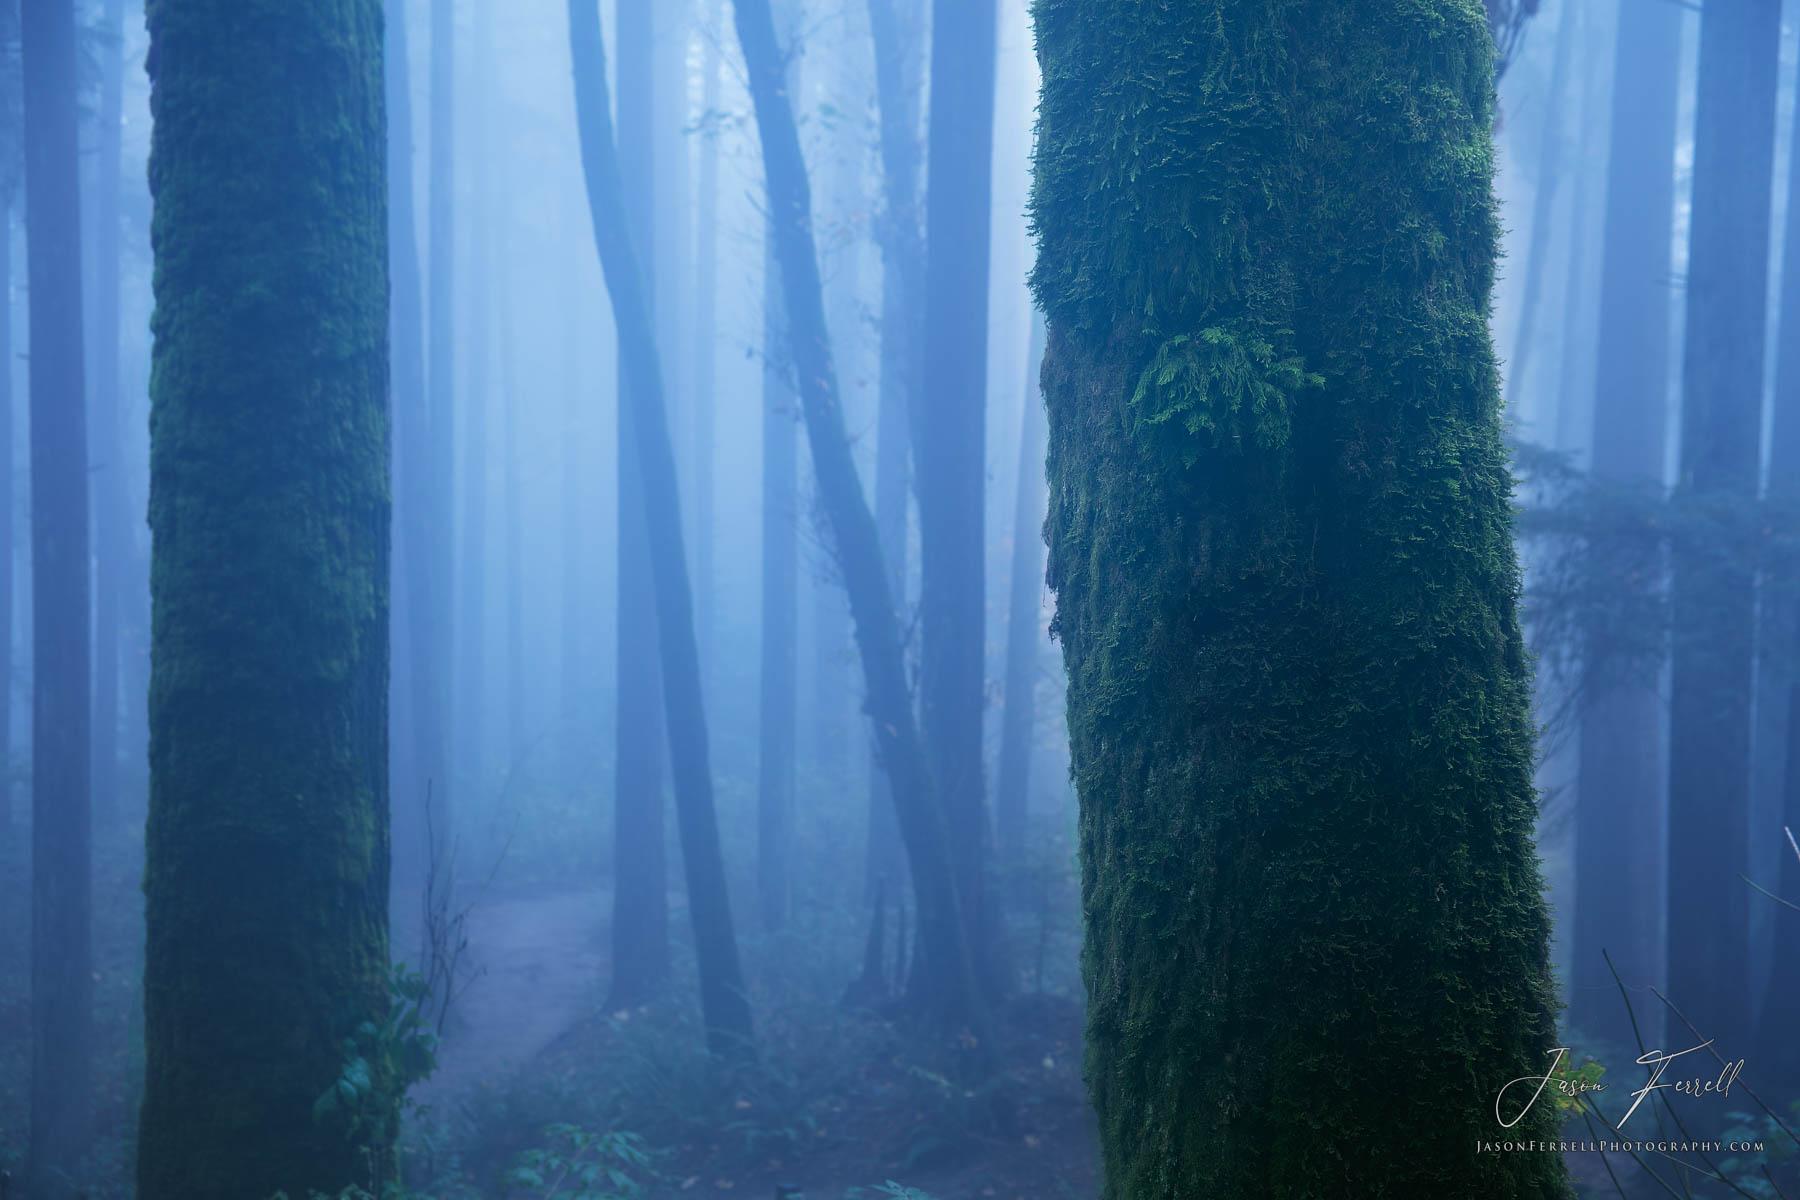 mystic forest, portland, oregon, photo